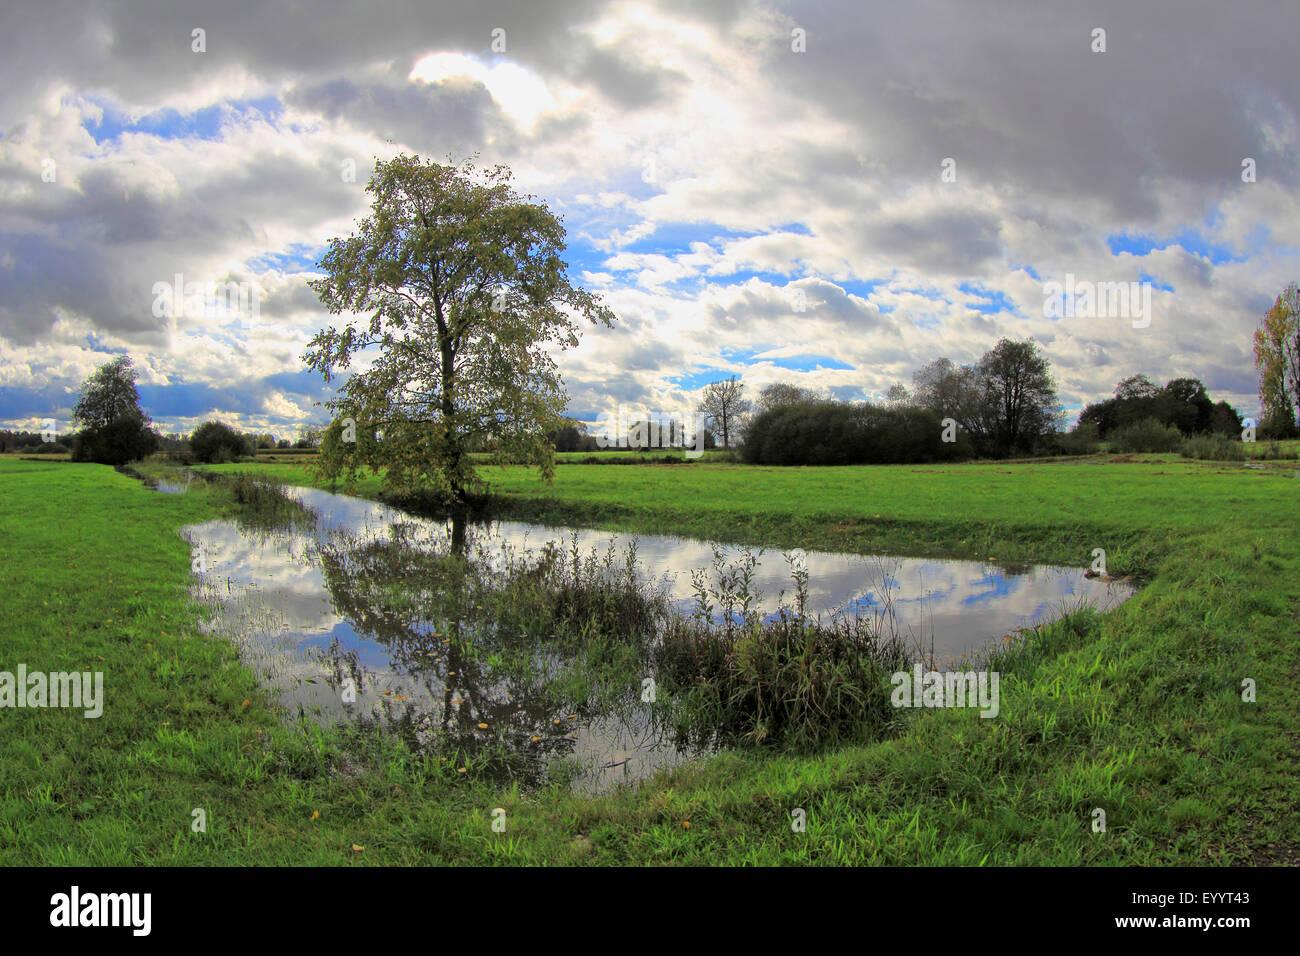 pastureland with tree, creek , fields and cloudy sky, Germany, Baden-Wuerttemberg, Ortenau - Stock Image